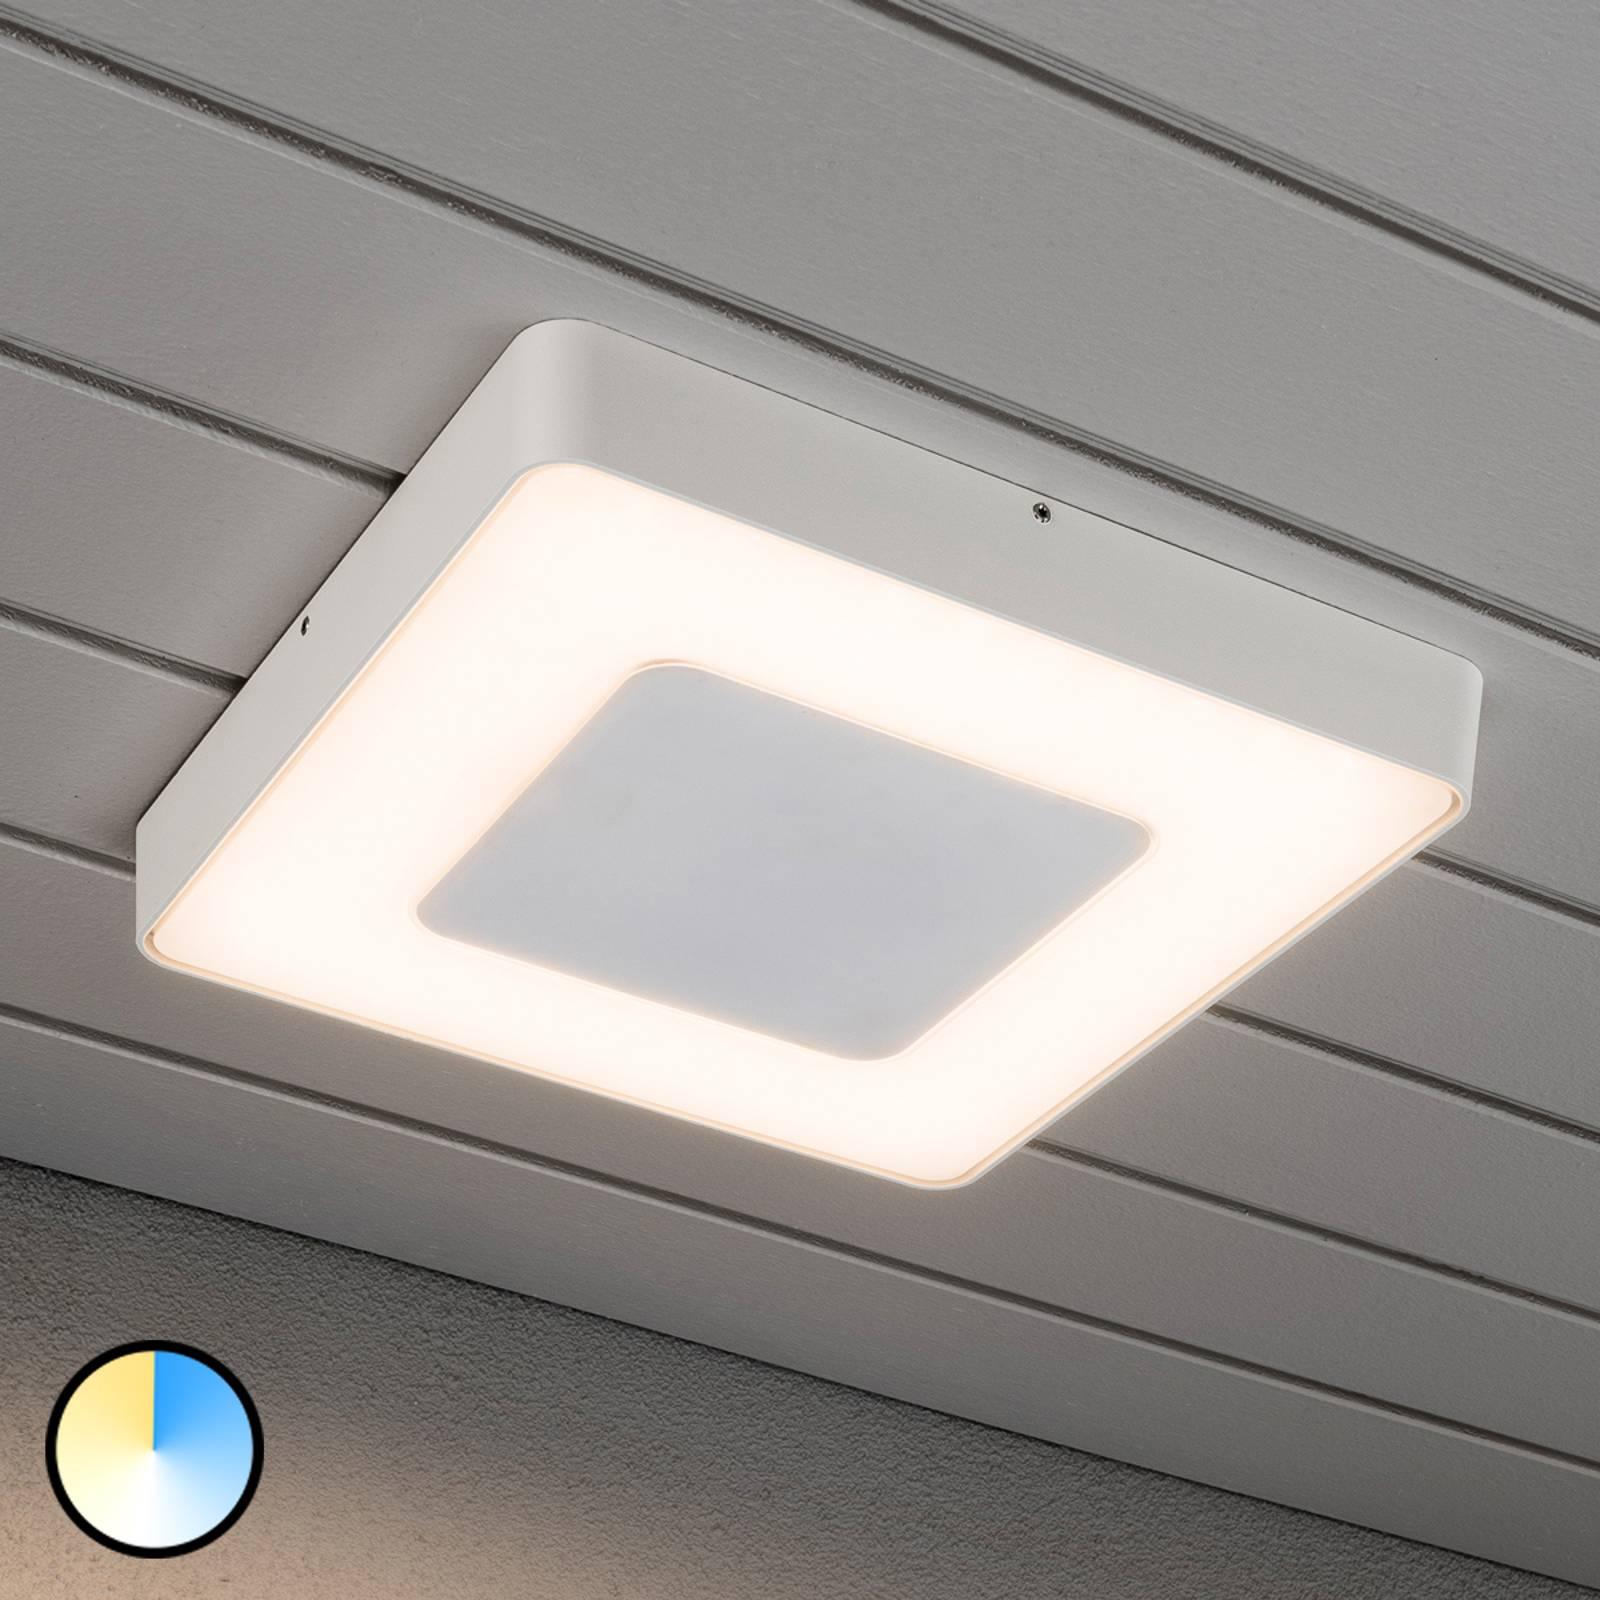 Carrara - biała kwadratowa lampa sufitowa zew. LED